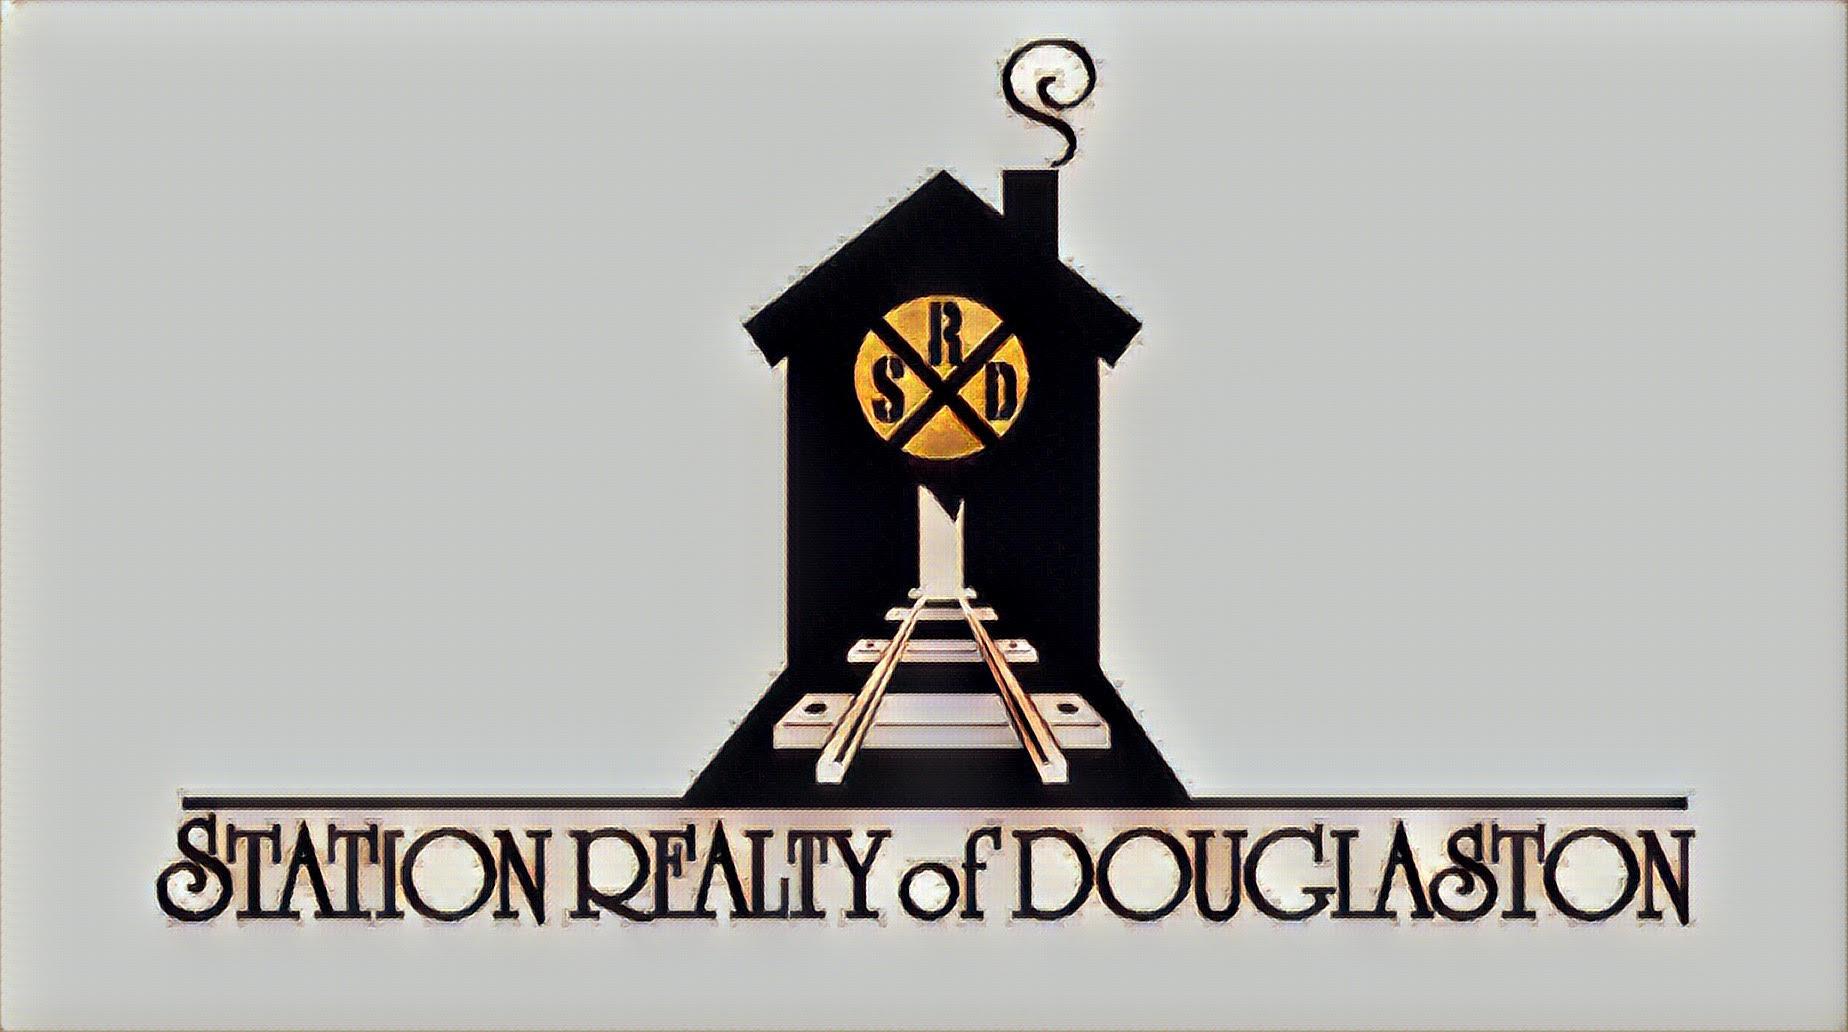 Station Realty of Douglaston